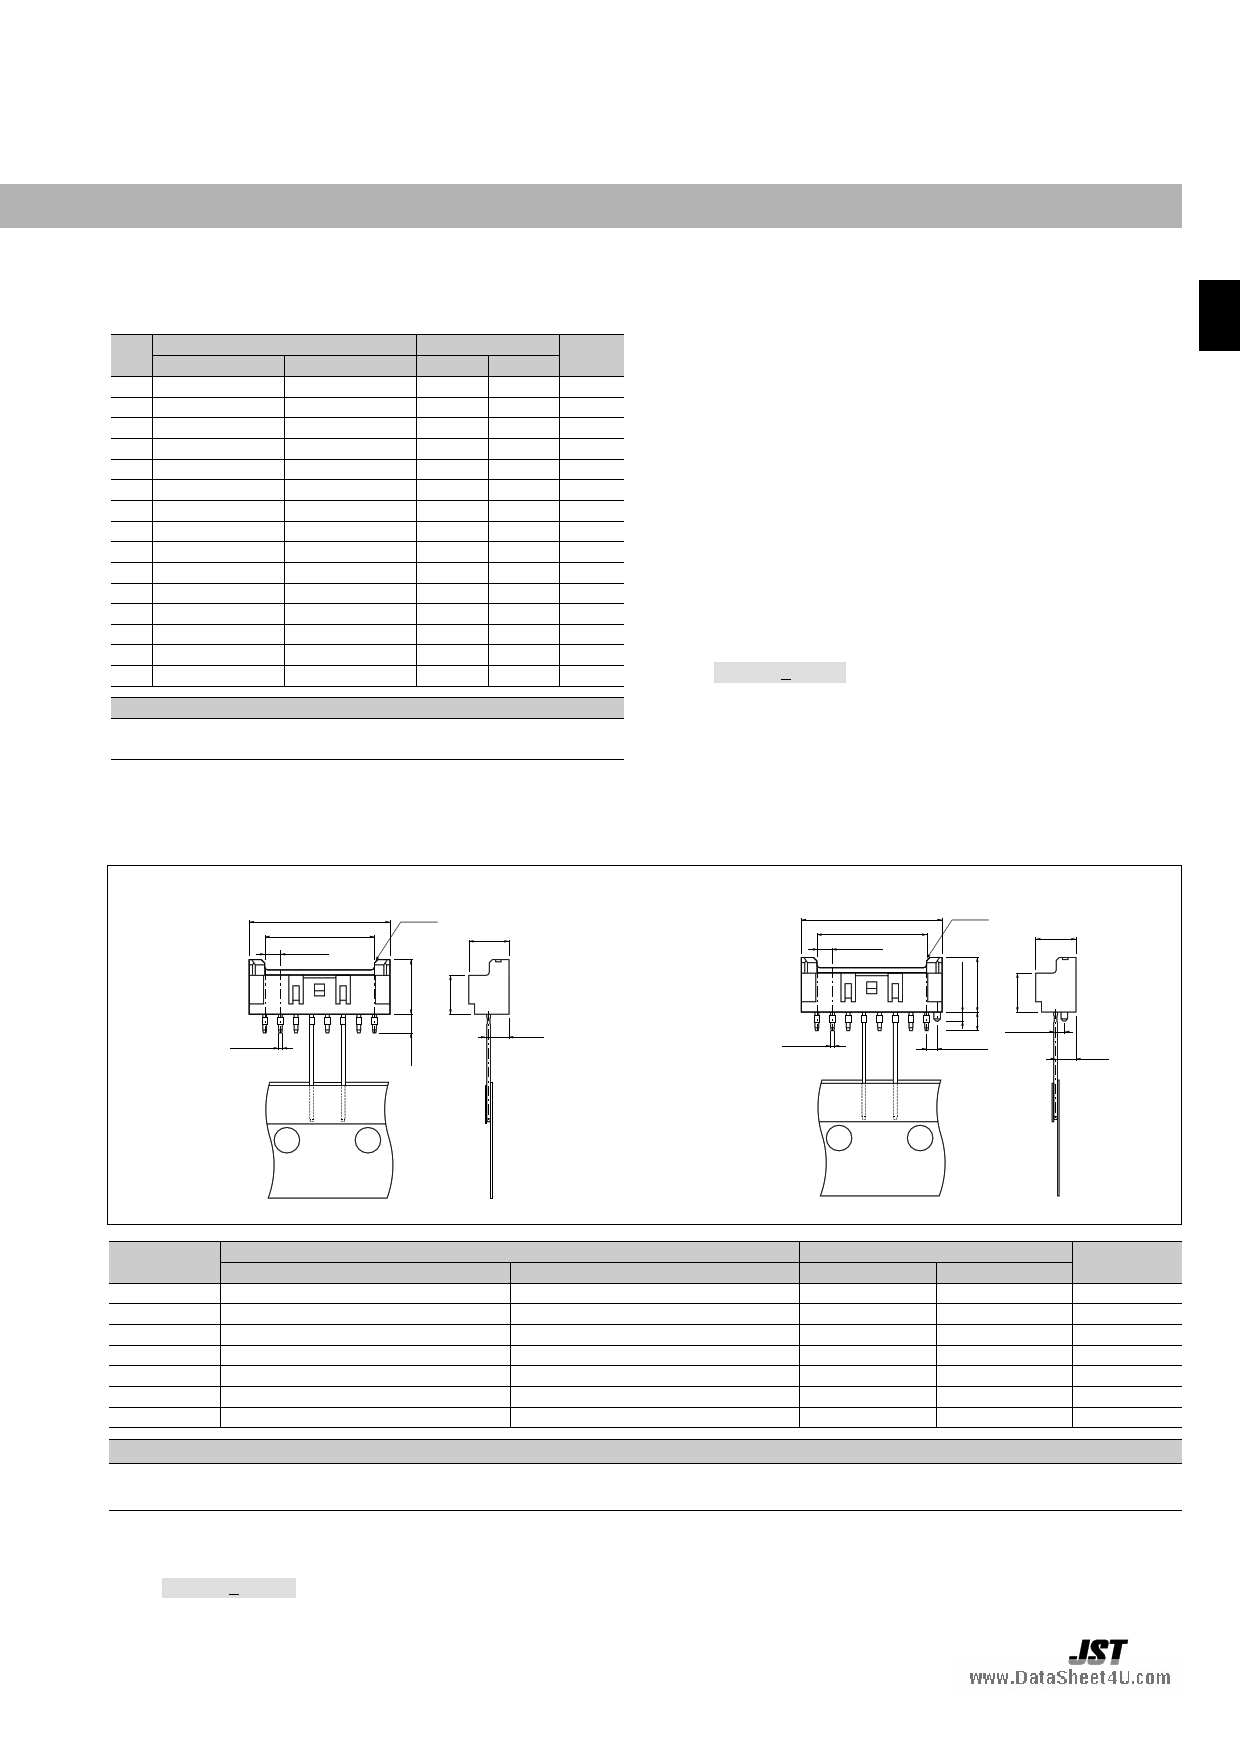 B-03B-XASK-1 pdf